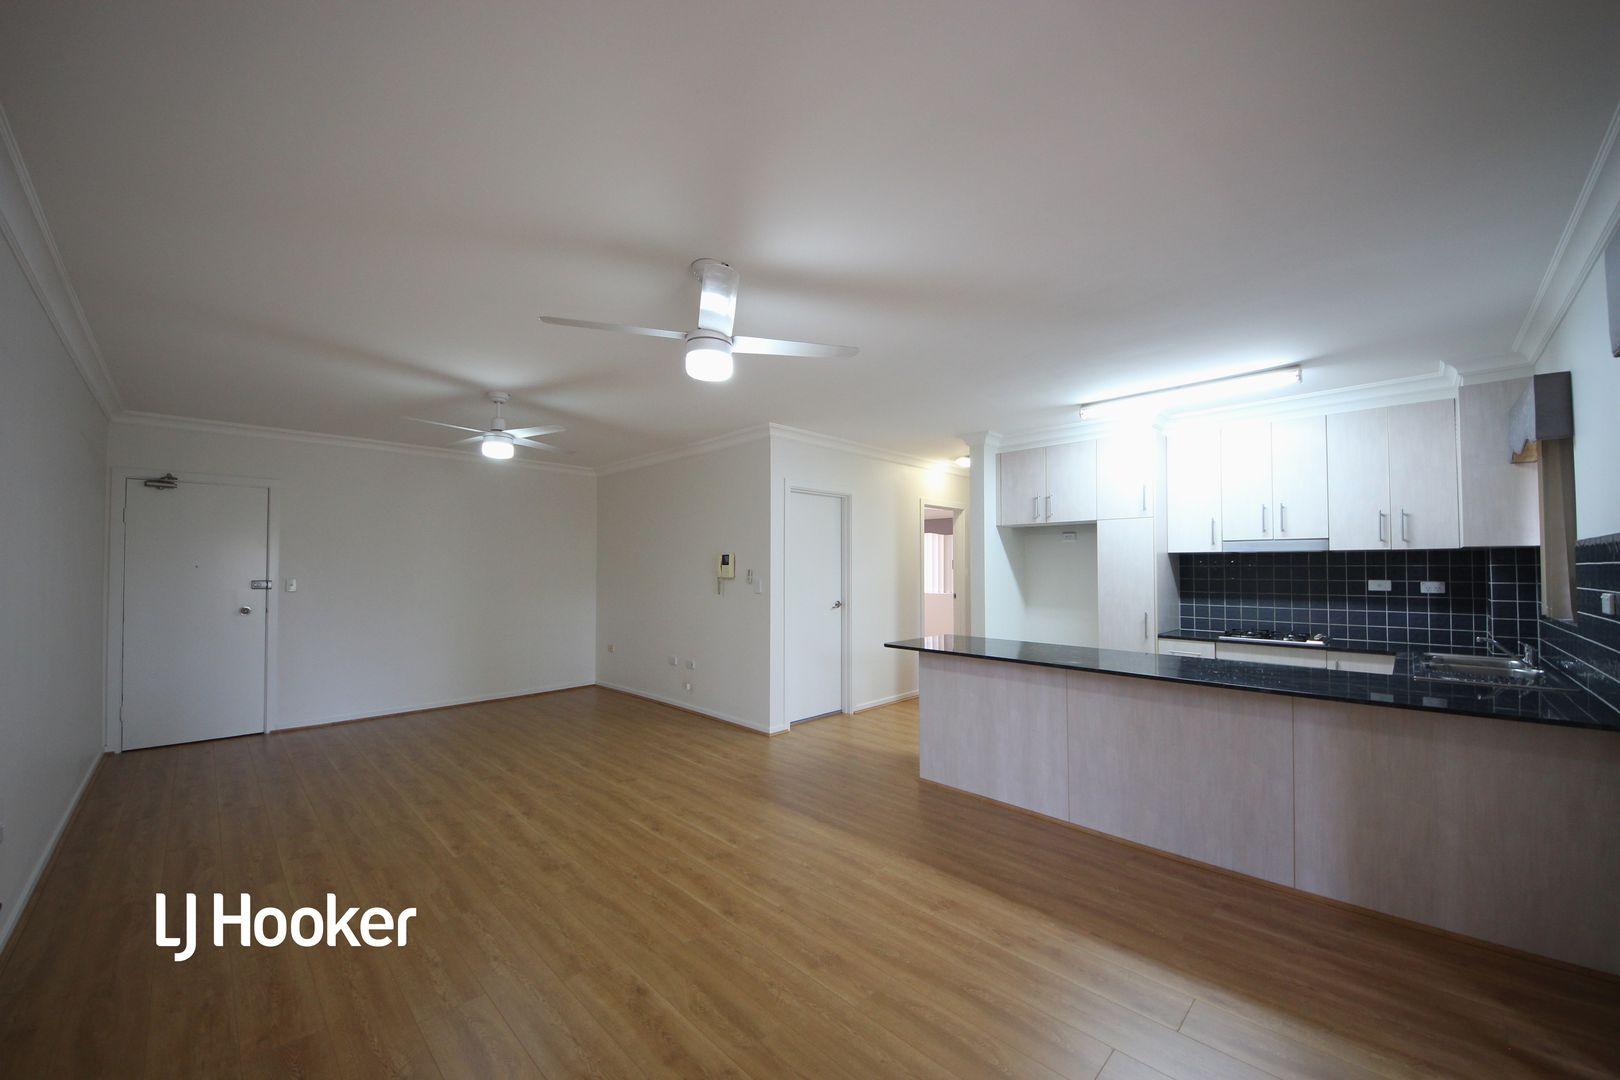 U06/38-40 Meryla Street, Burwood NSW 2134, Image 0